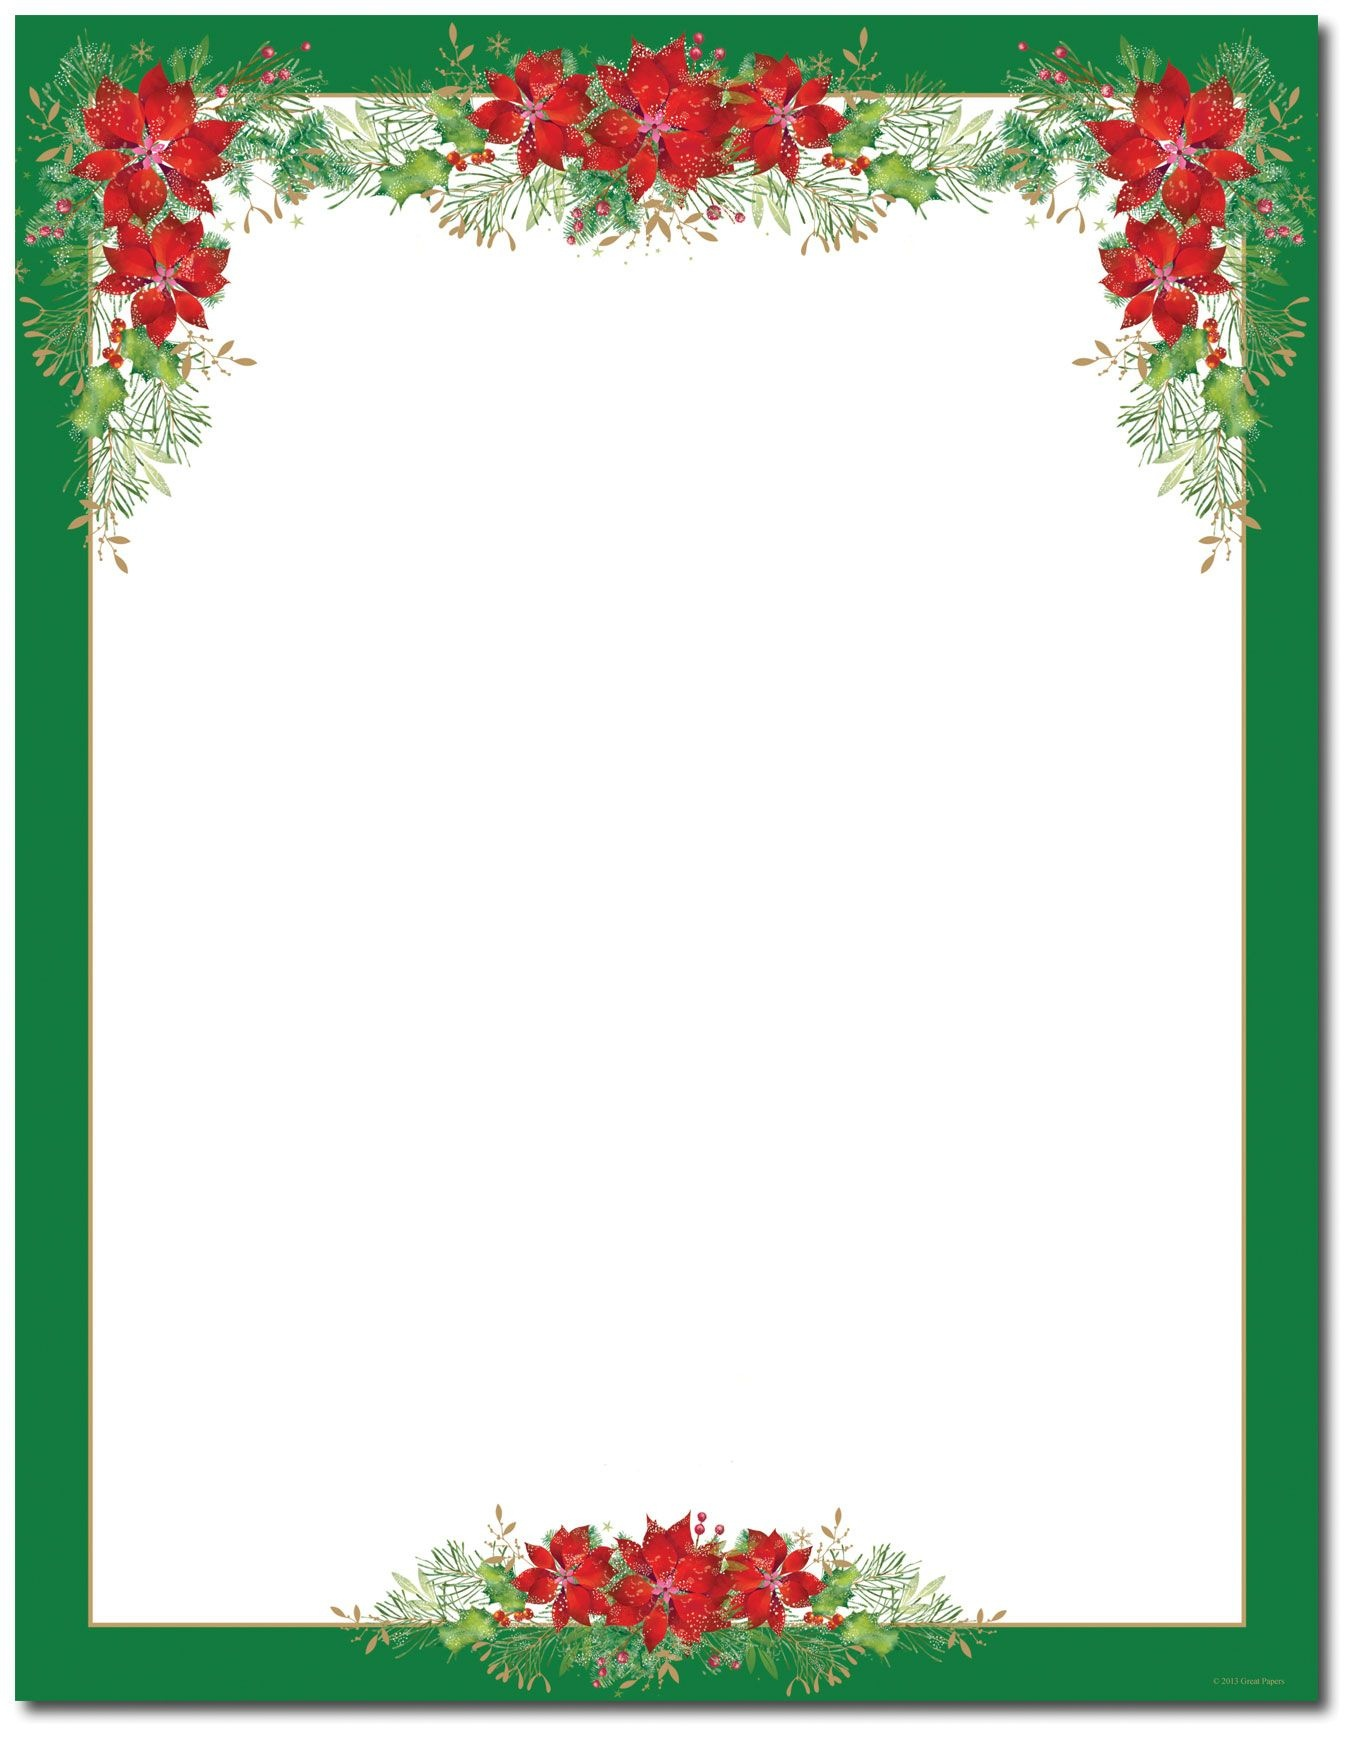 Poinsettia Valance Letterhead | Holiday Papers | Christmas Border - Free Printable Christmas Letterhead